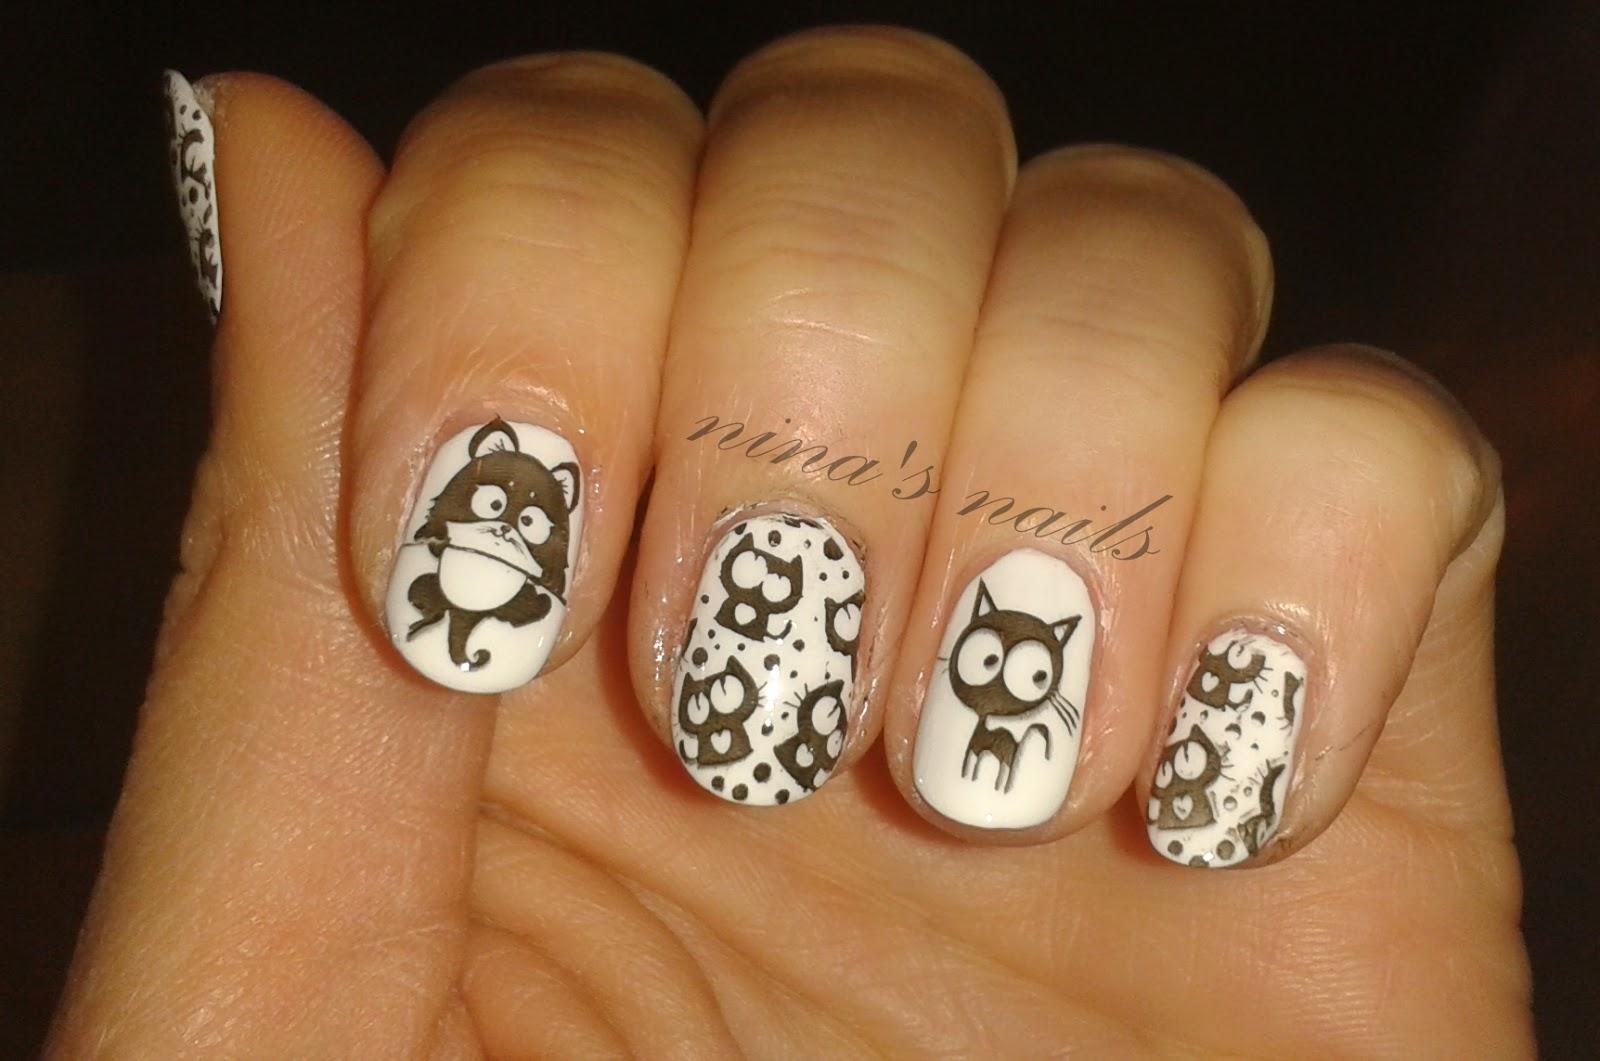 Pretty Lashes by Nina - Reviews | Facebook